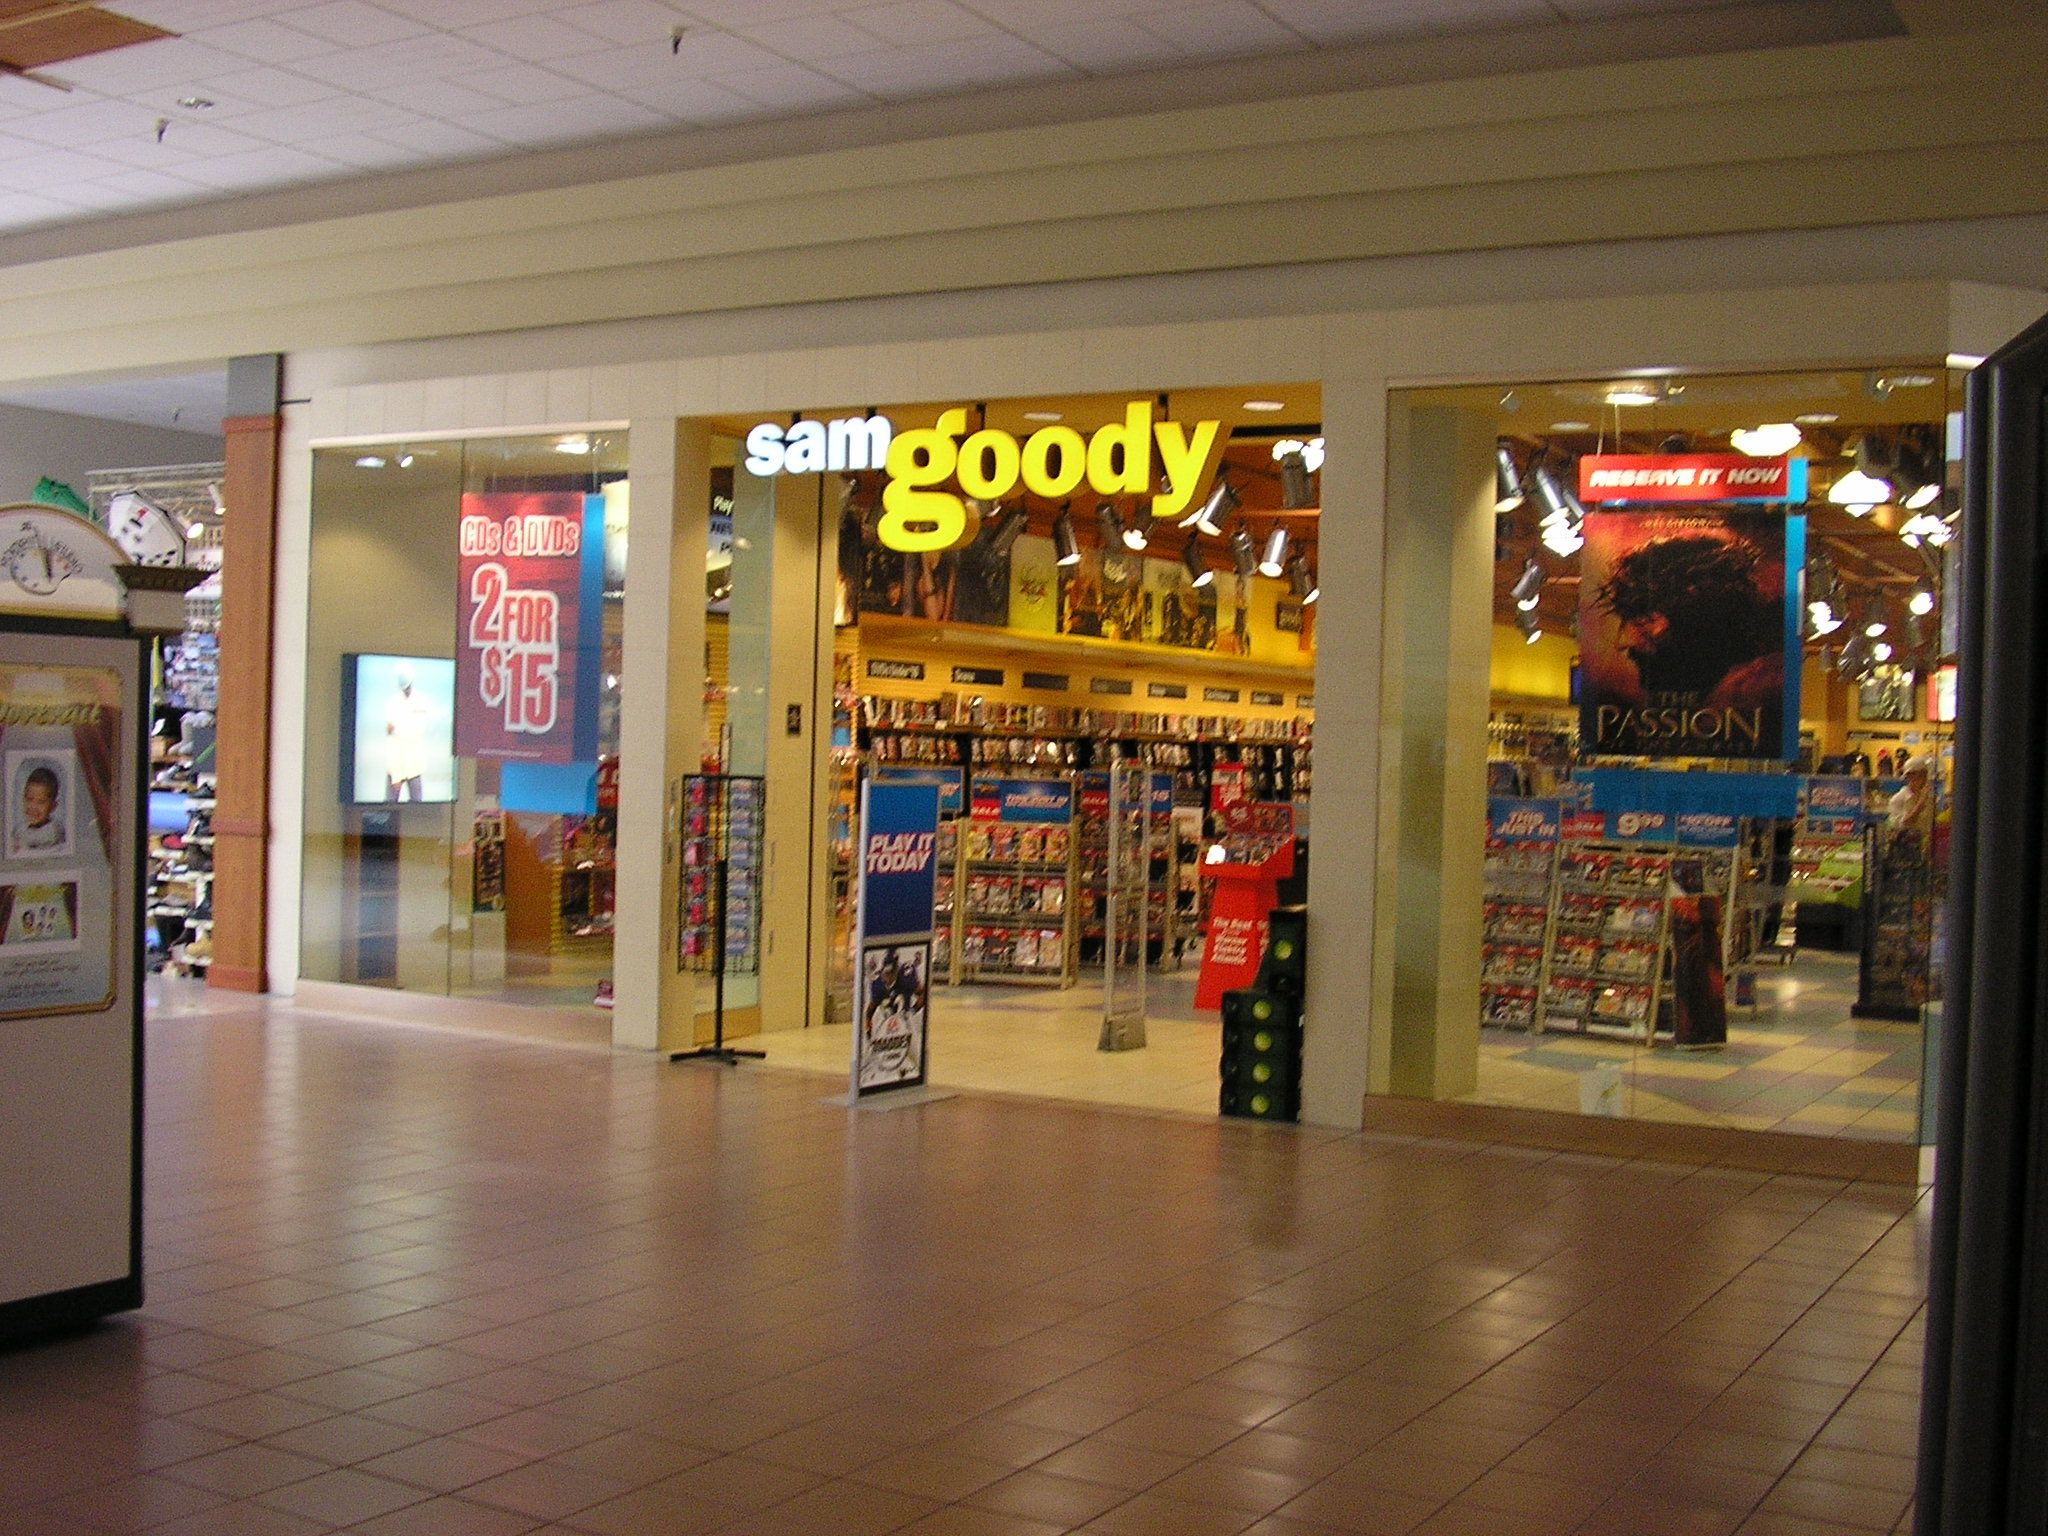 Sam Goody storefront